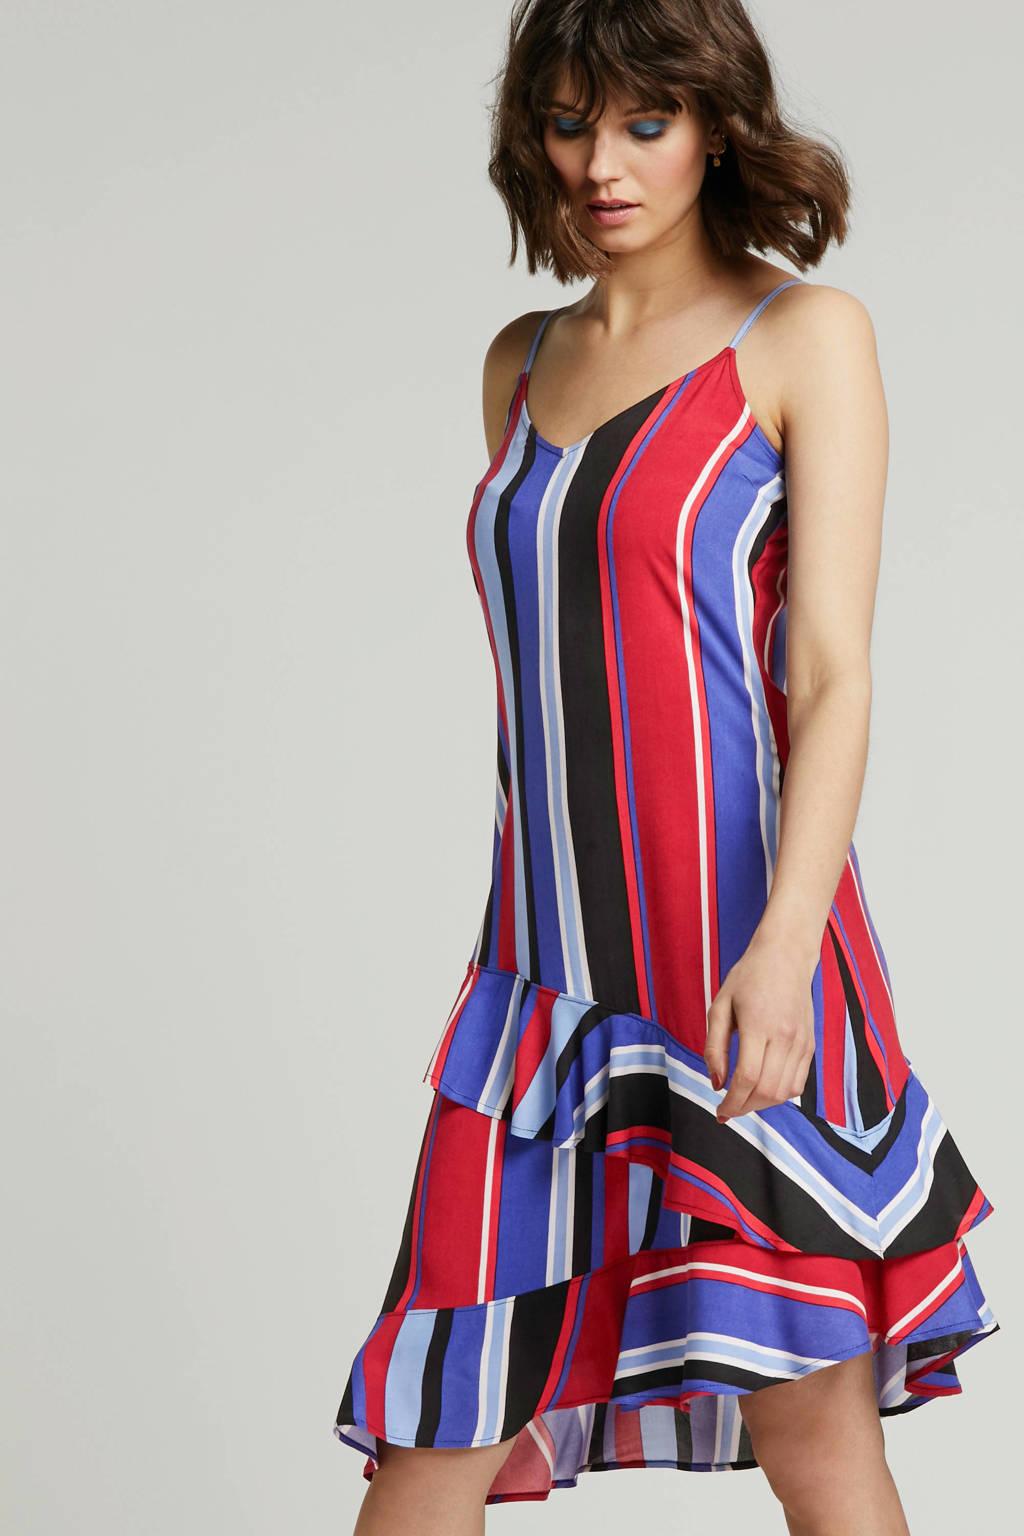 whkmp's beachwave geweven viscose jurk met streepprint, Blauw/rood/zwart